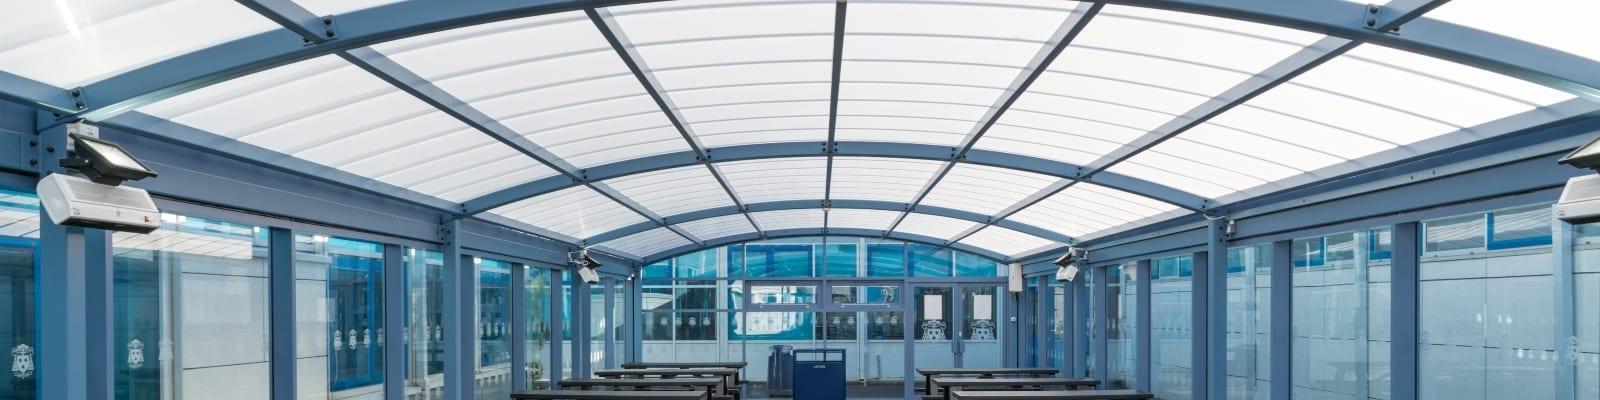 St Wilfrid's High School Enclosed Canopy